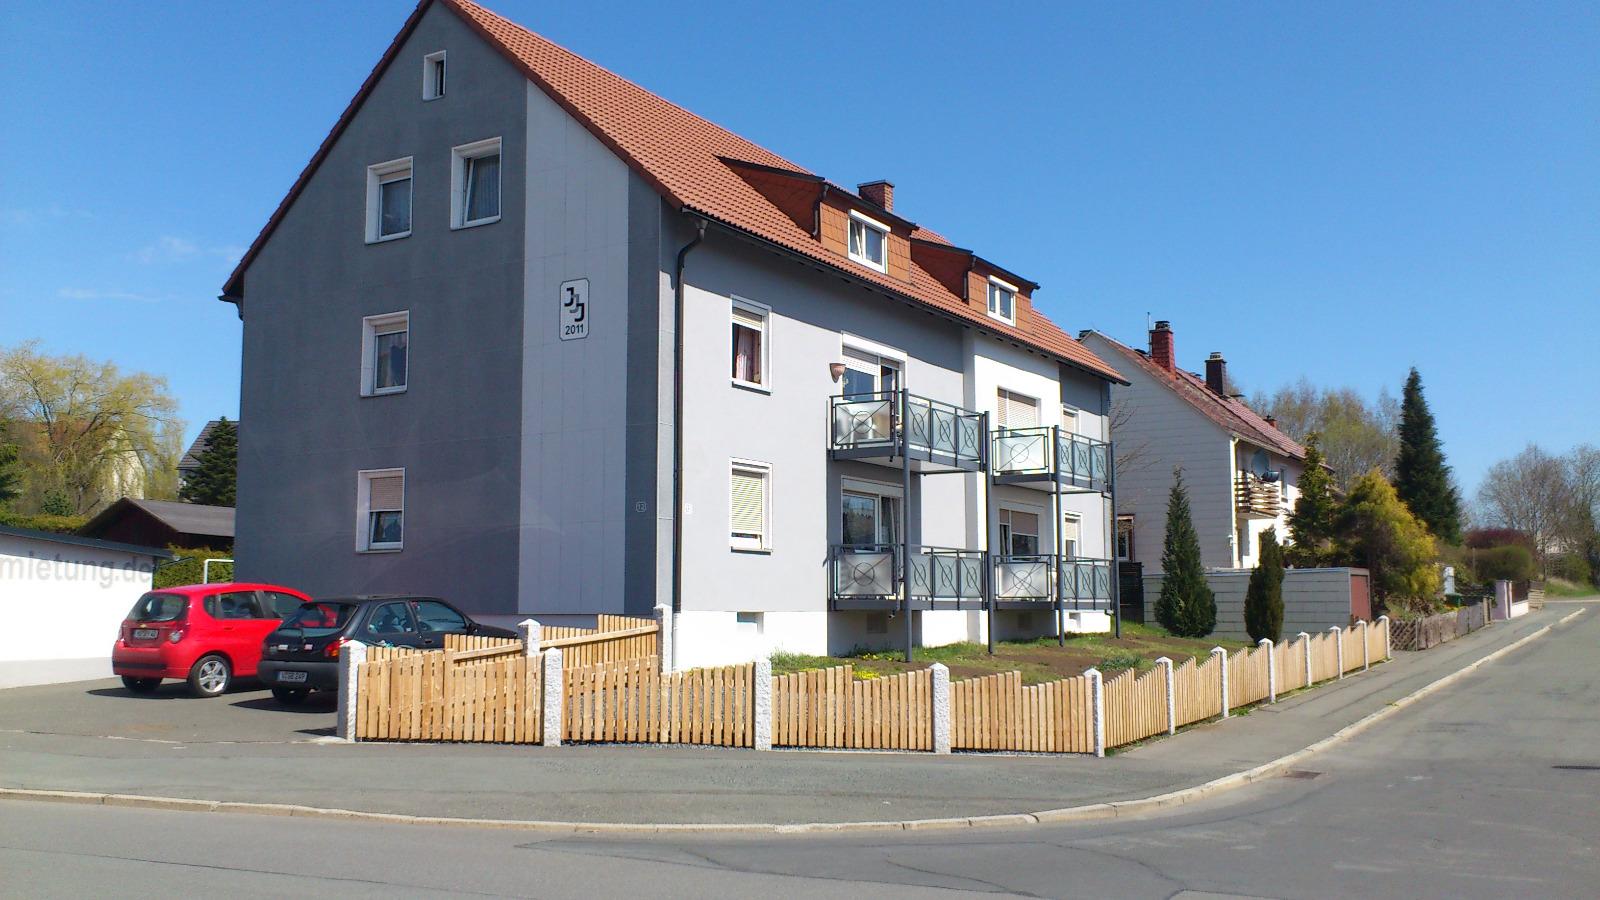 Mehrfamilienhaus Hof Luisenburgstraße 12